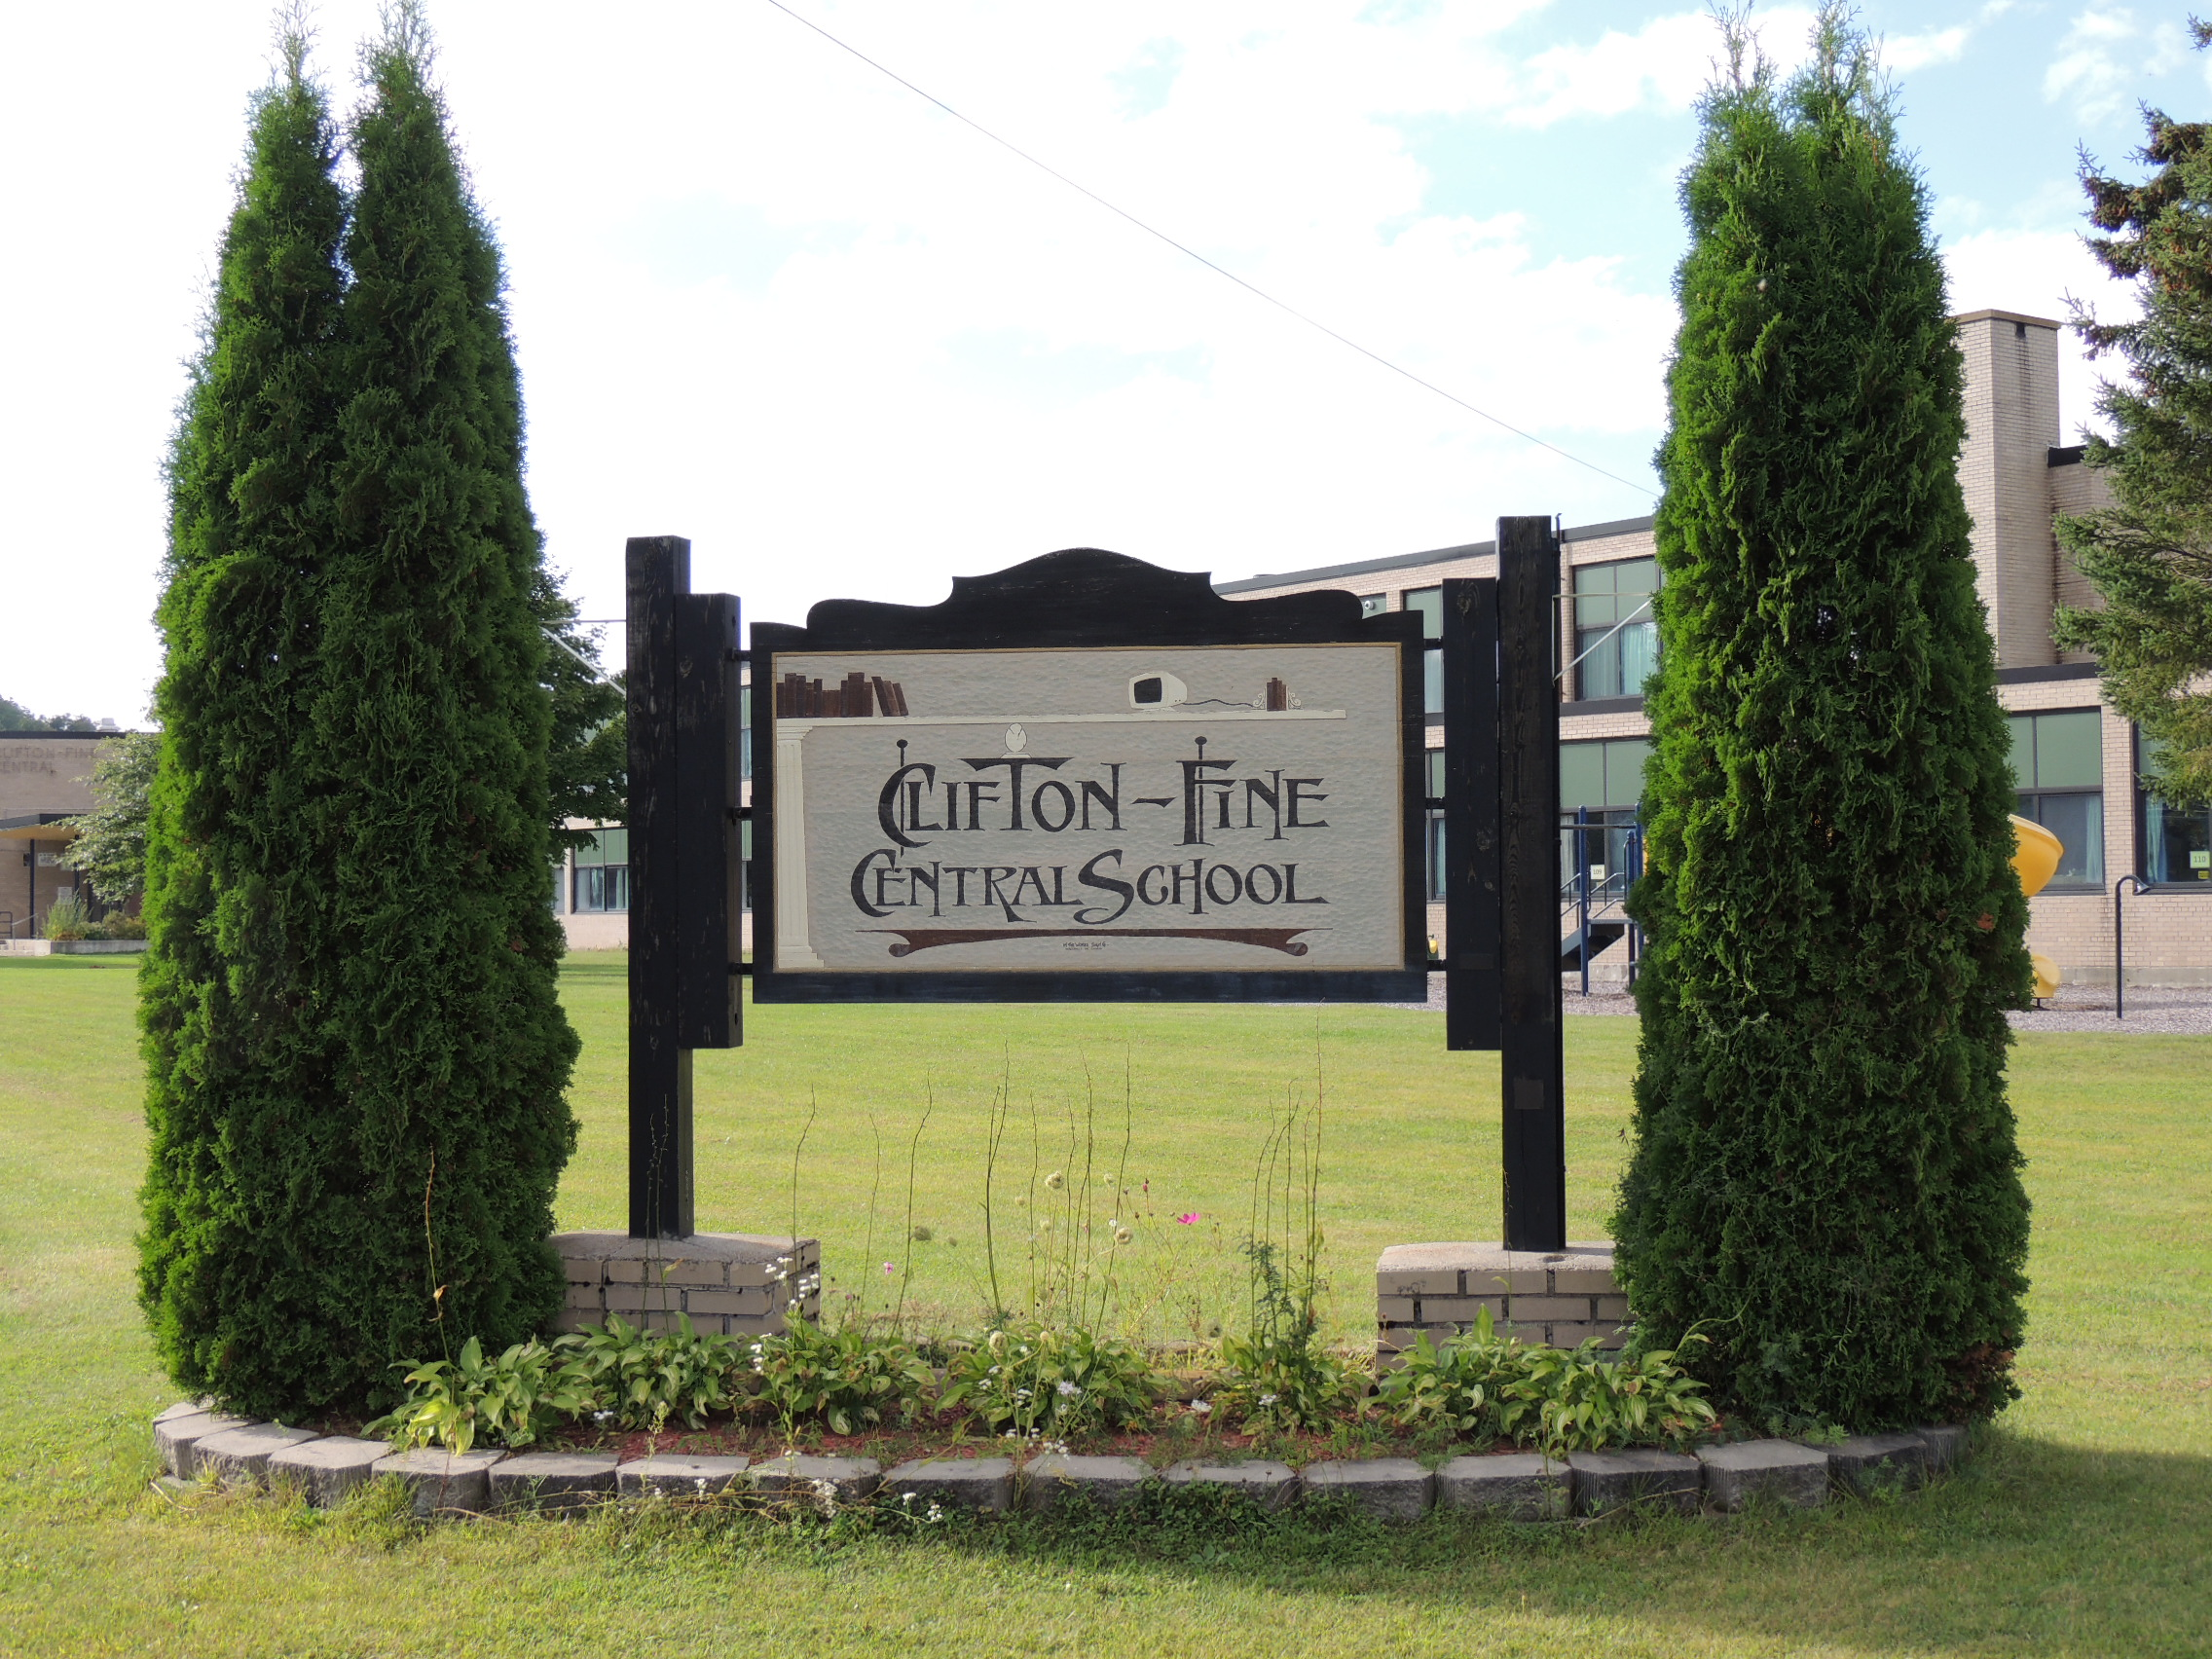 Clifton-Fine Central School